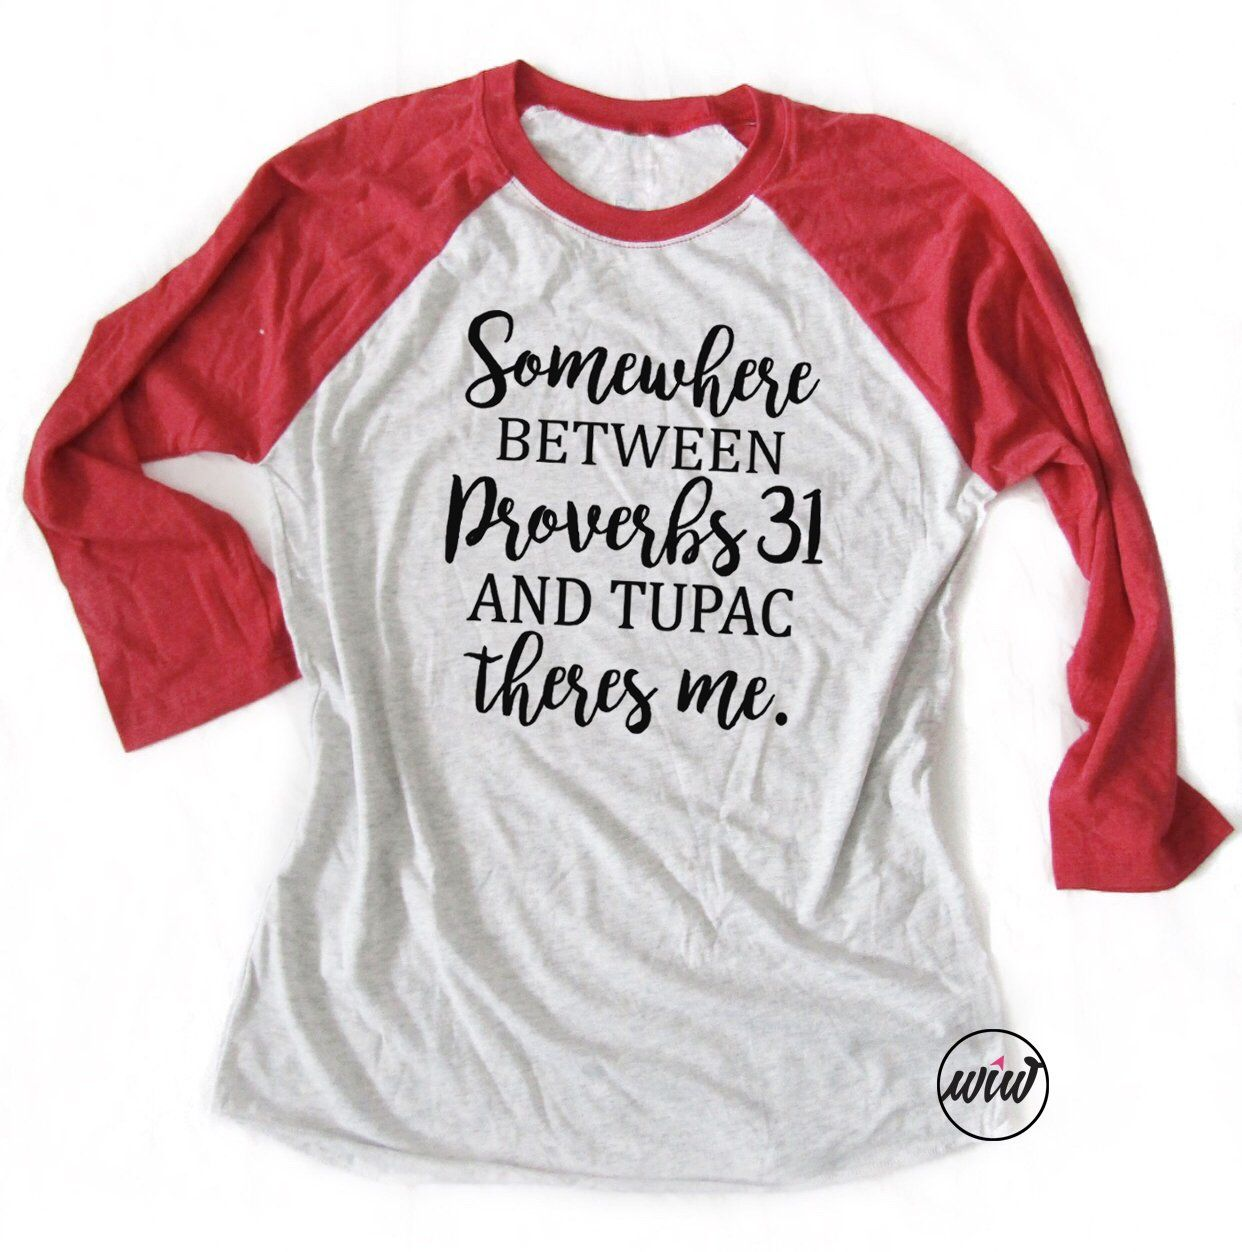 e68d0a2fb Somewhere Between Proverbs and Tupac Baseball Tee. Gangster Rap. Proverbs Shirt  Funny Graphic Tee. Girl Boss. Cool Mom #proverbs #gangster #gangsta #rap ...